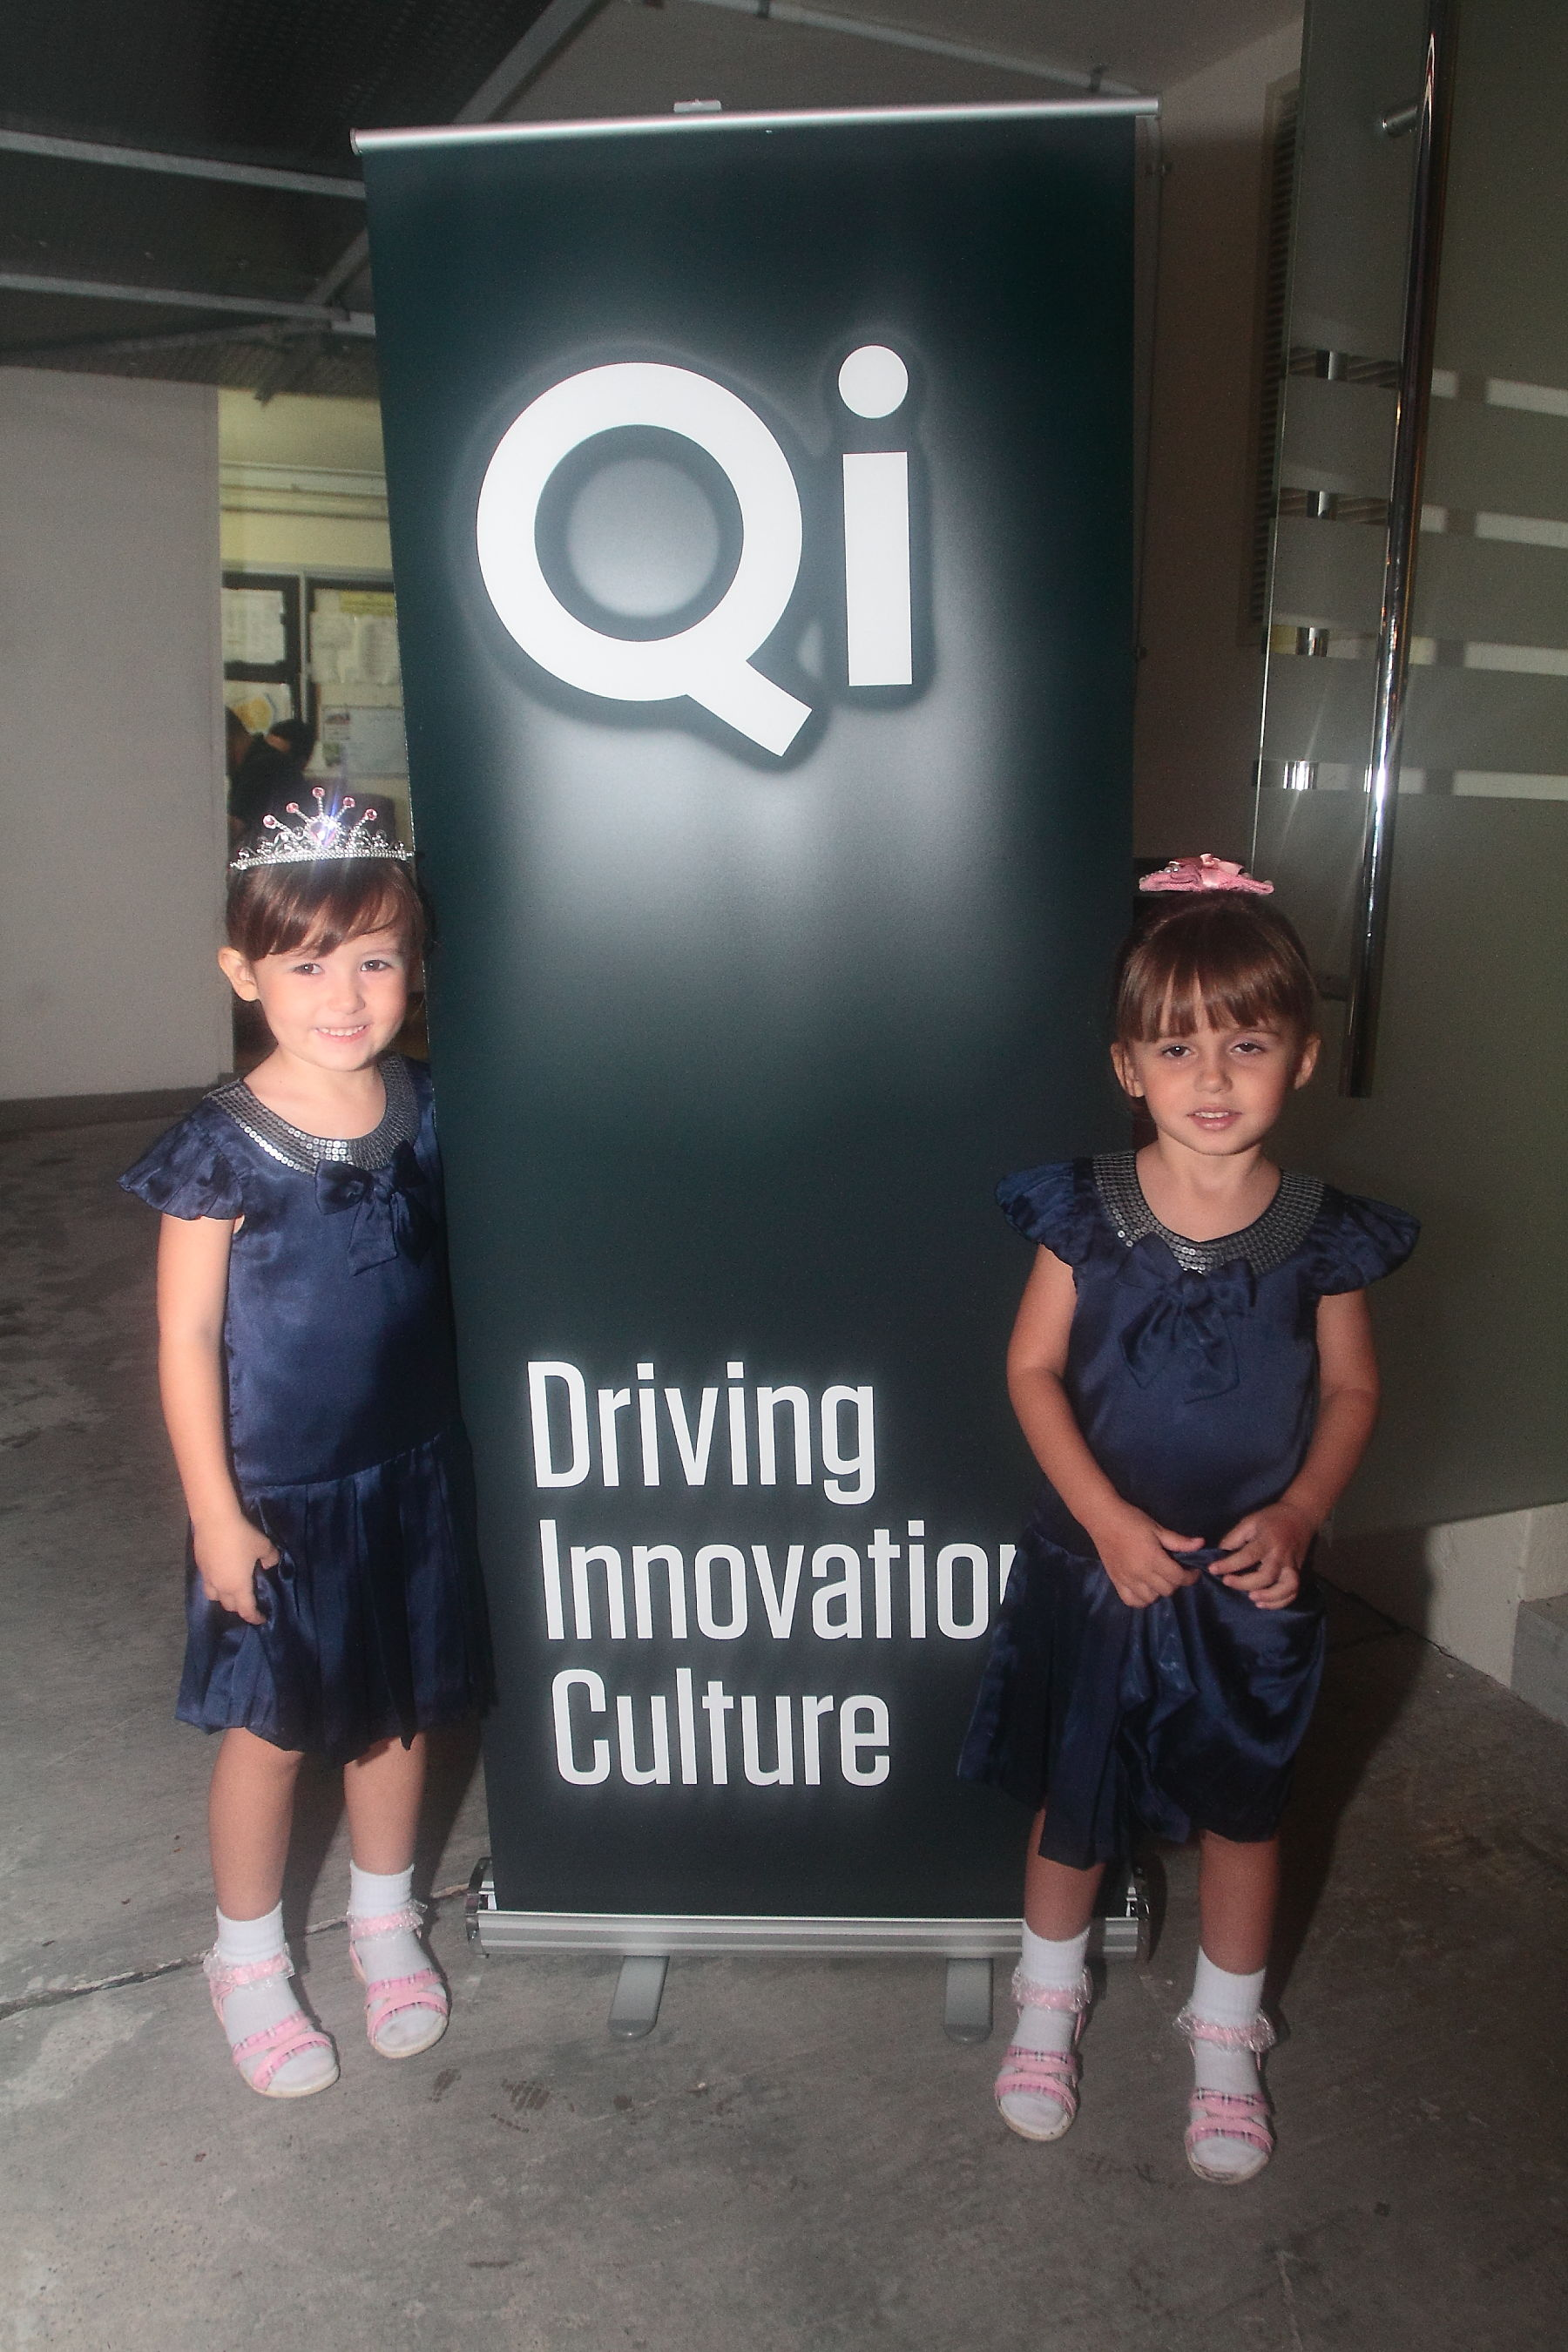 qi-global-2011-driving-innovation-culture-007.jpg